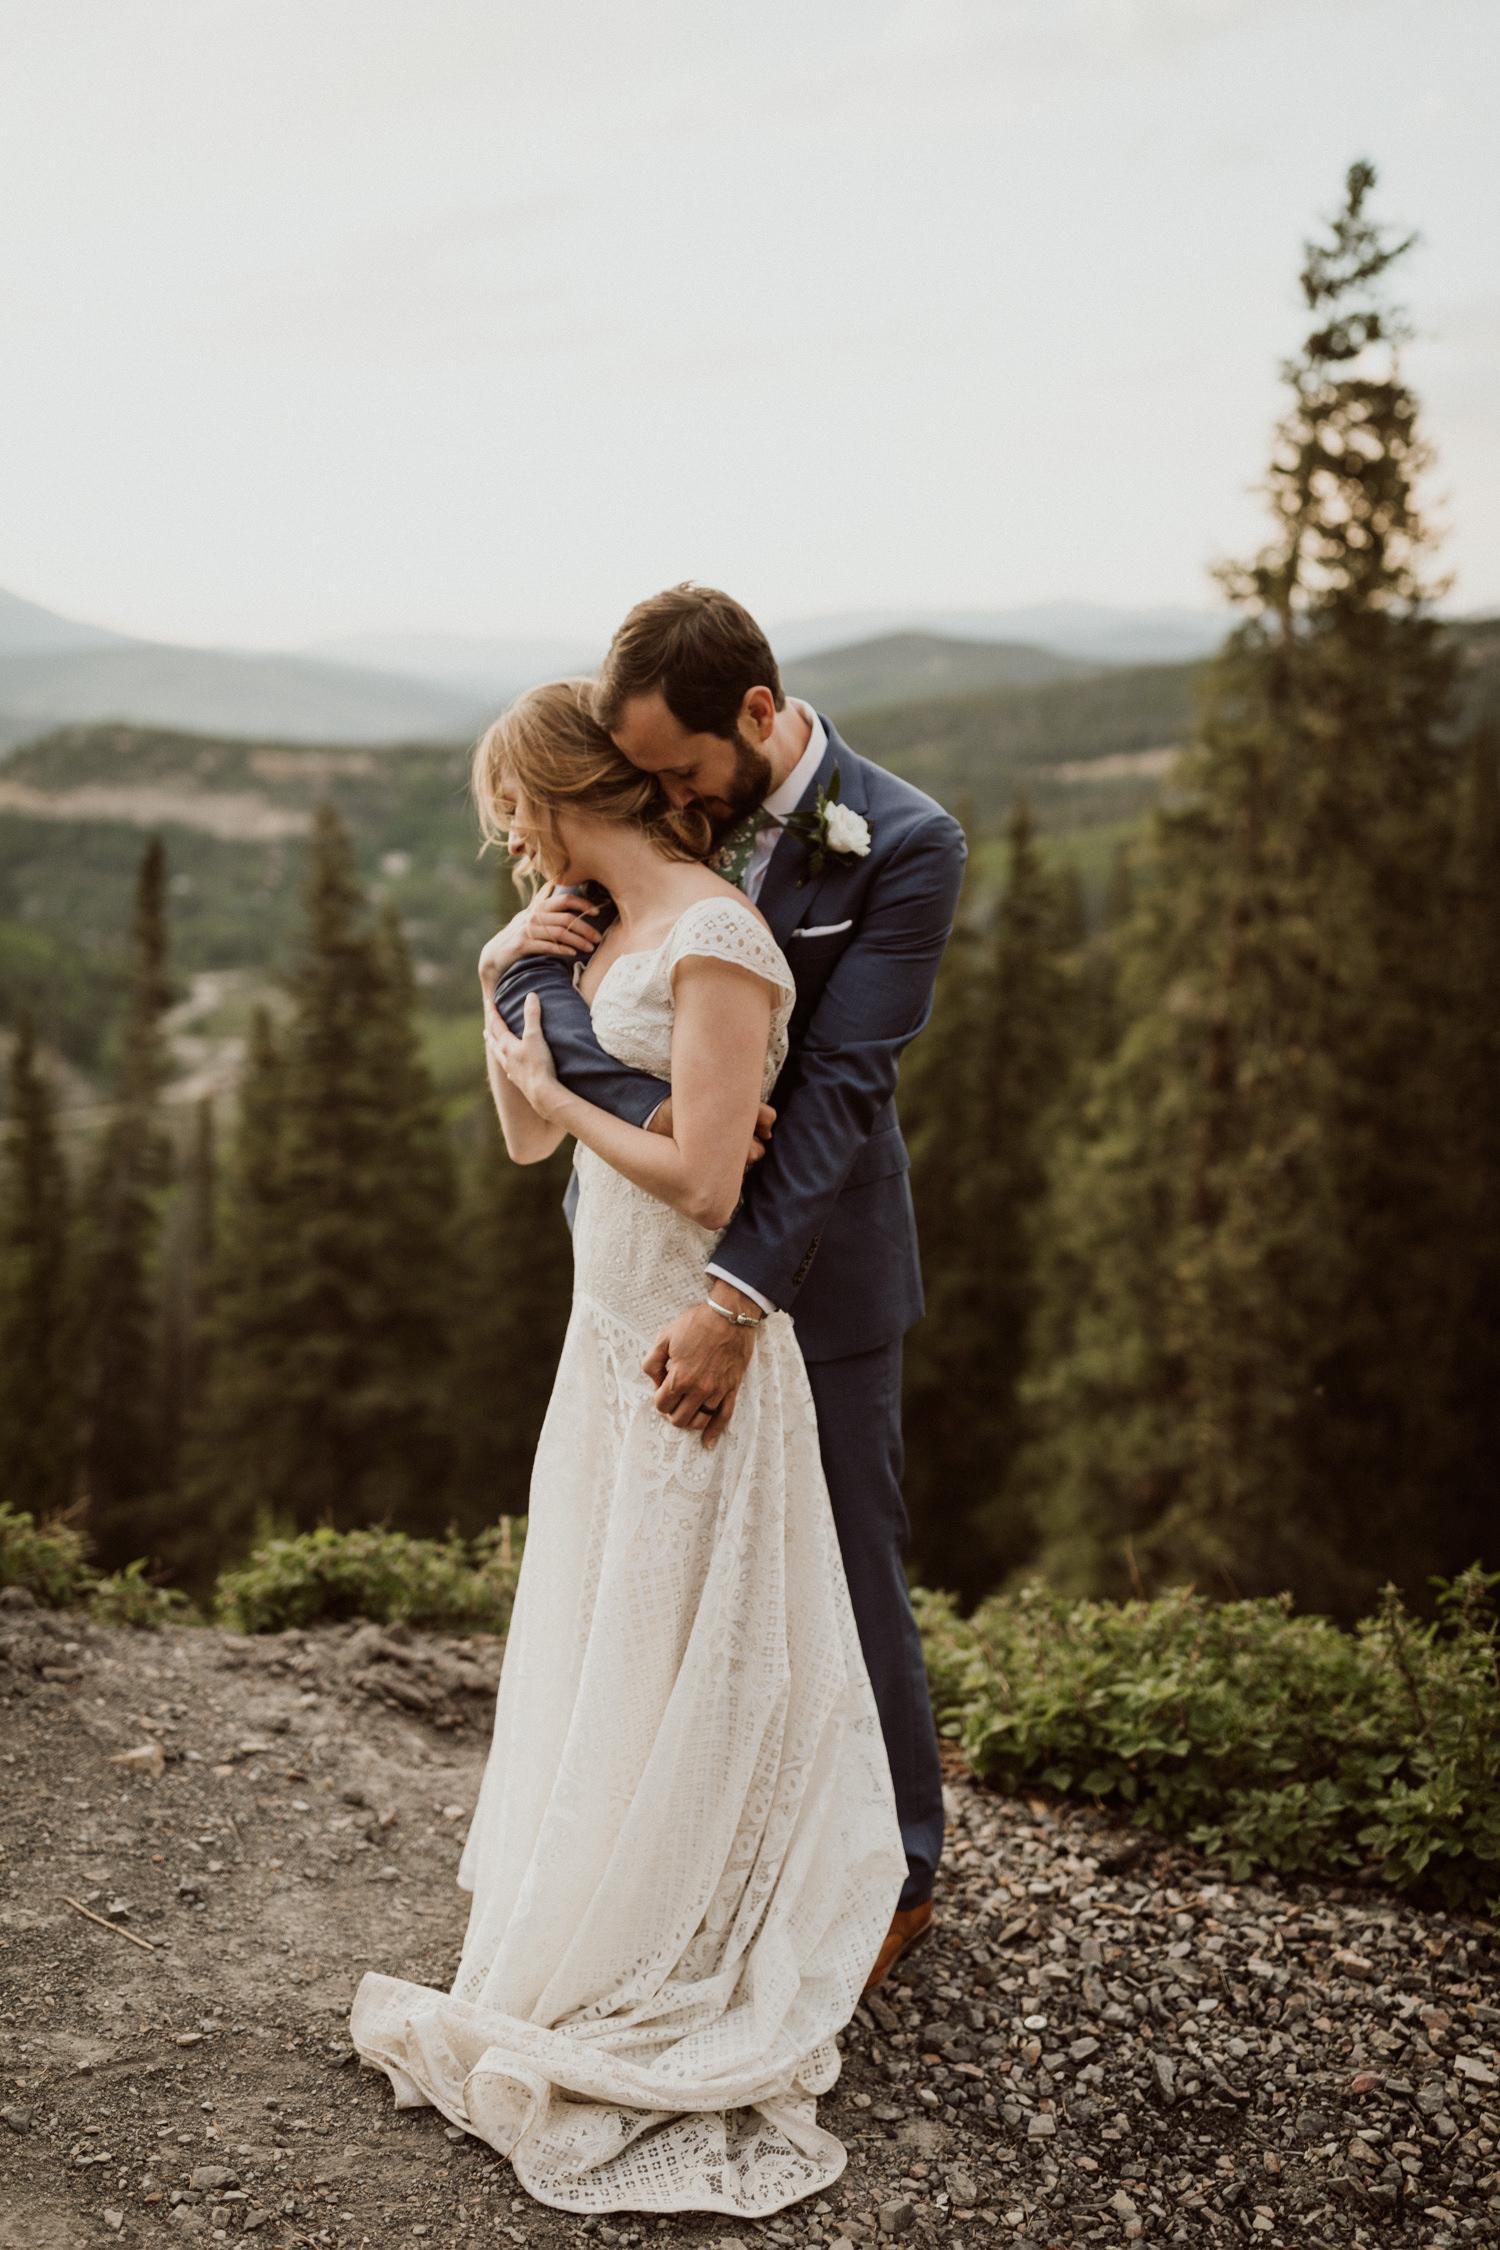 bohemian-backyard-wedding-breckenridge-colorado-126.jpg